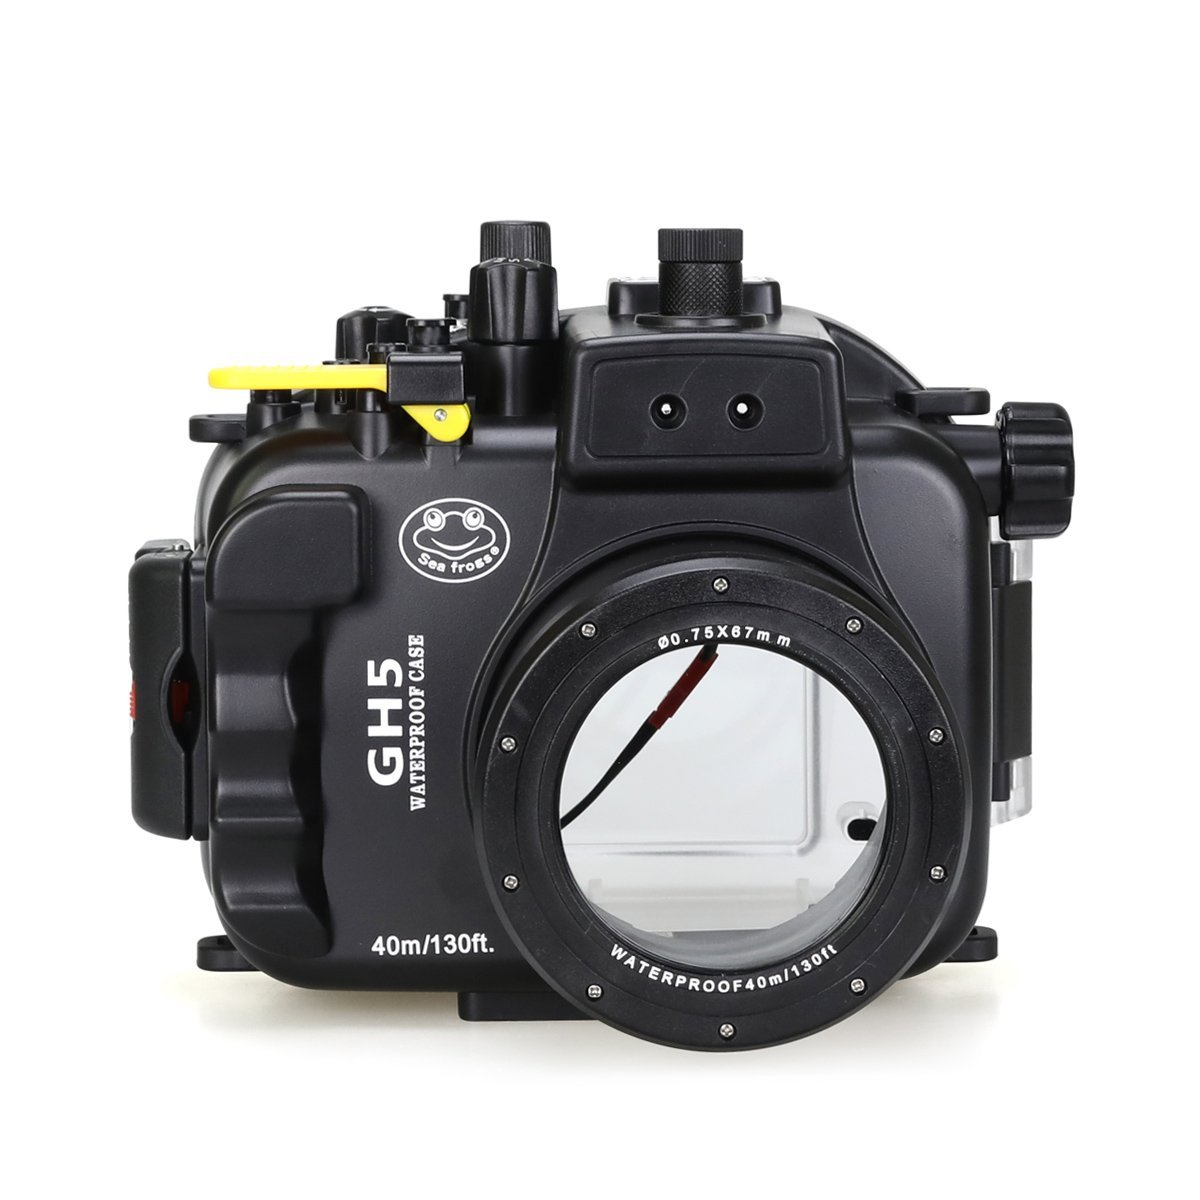 все цены на Meikon Seafrogs 40m 130ft Underwater Camera Housing Case for Panasonnic GH5,Waterproof Bags Case for Panasonnic GH5 Camera